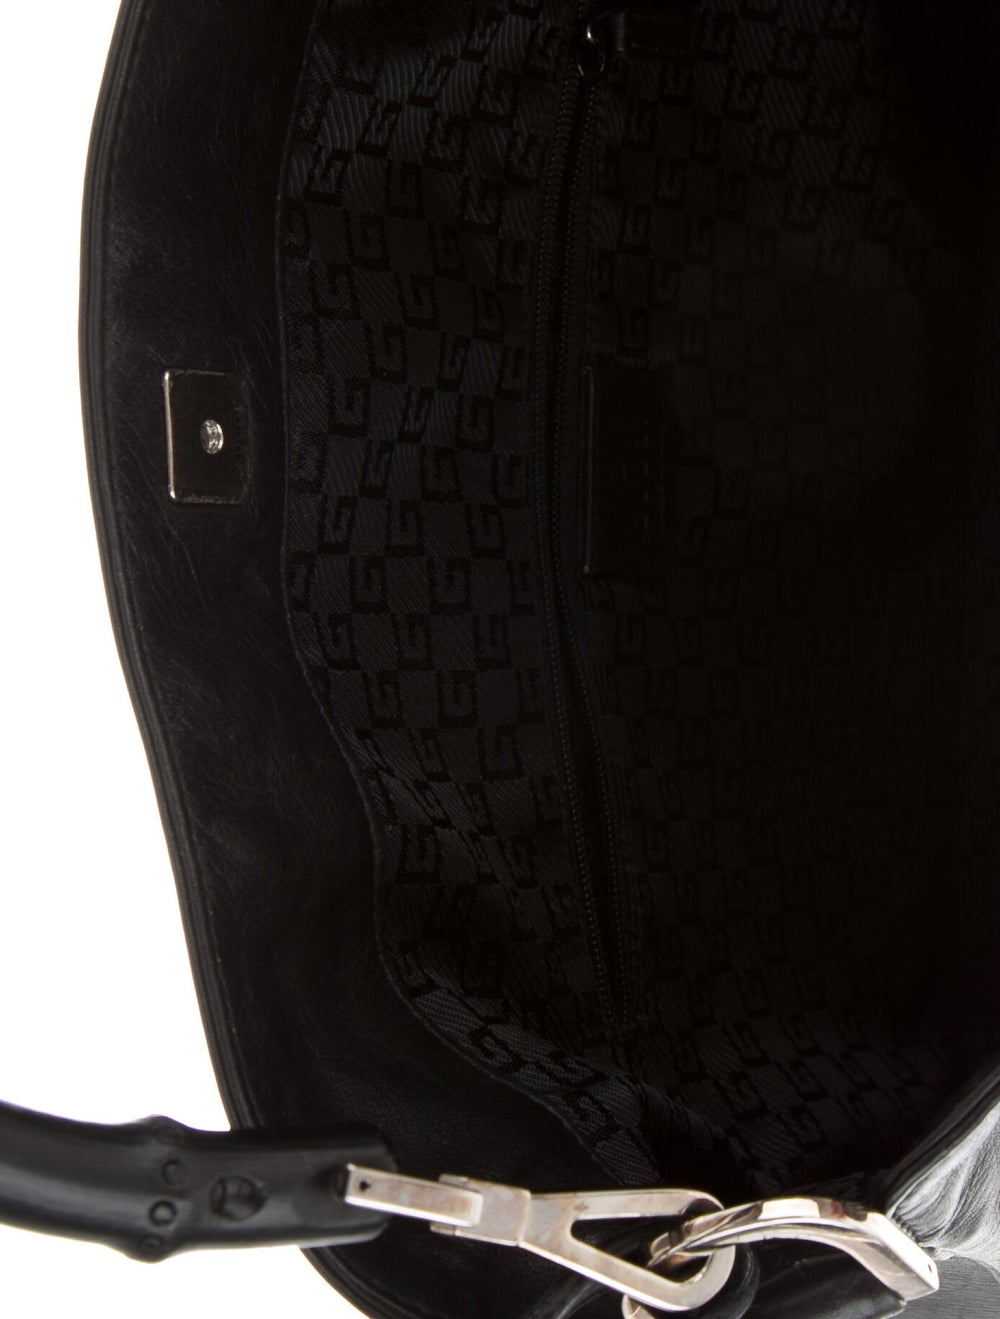 Gucci Vintage Leather Bamboo Handle Bag Black - image 5